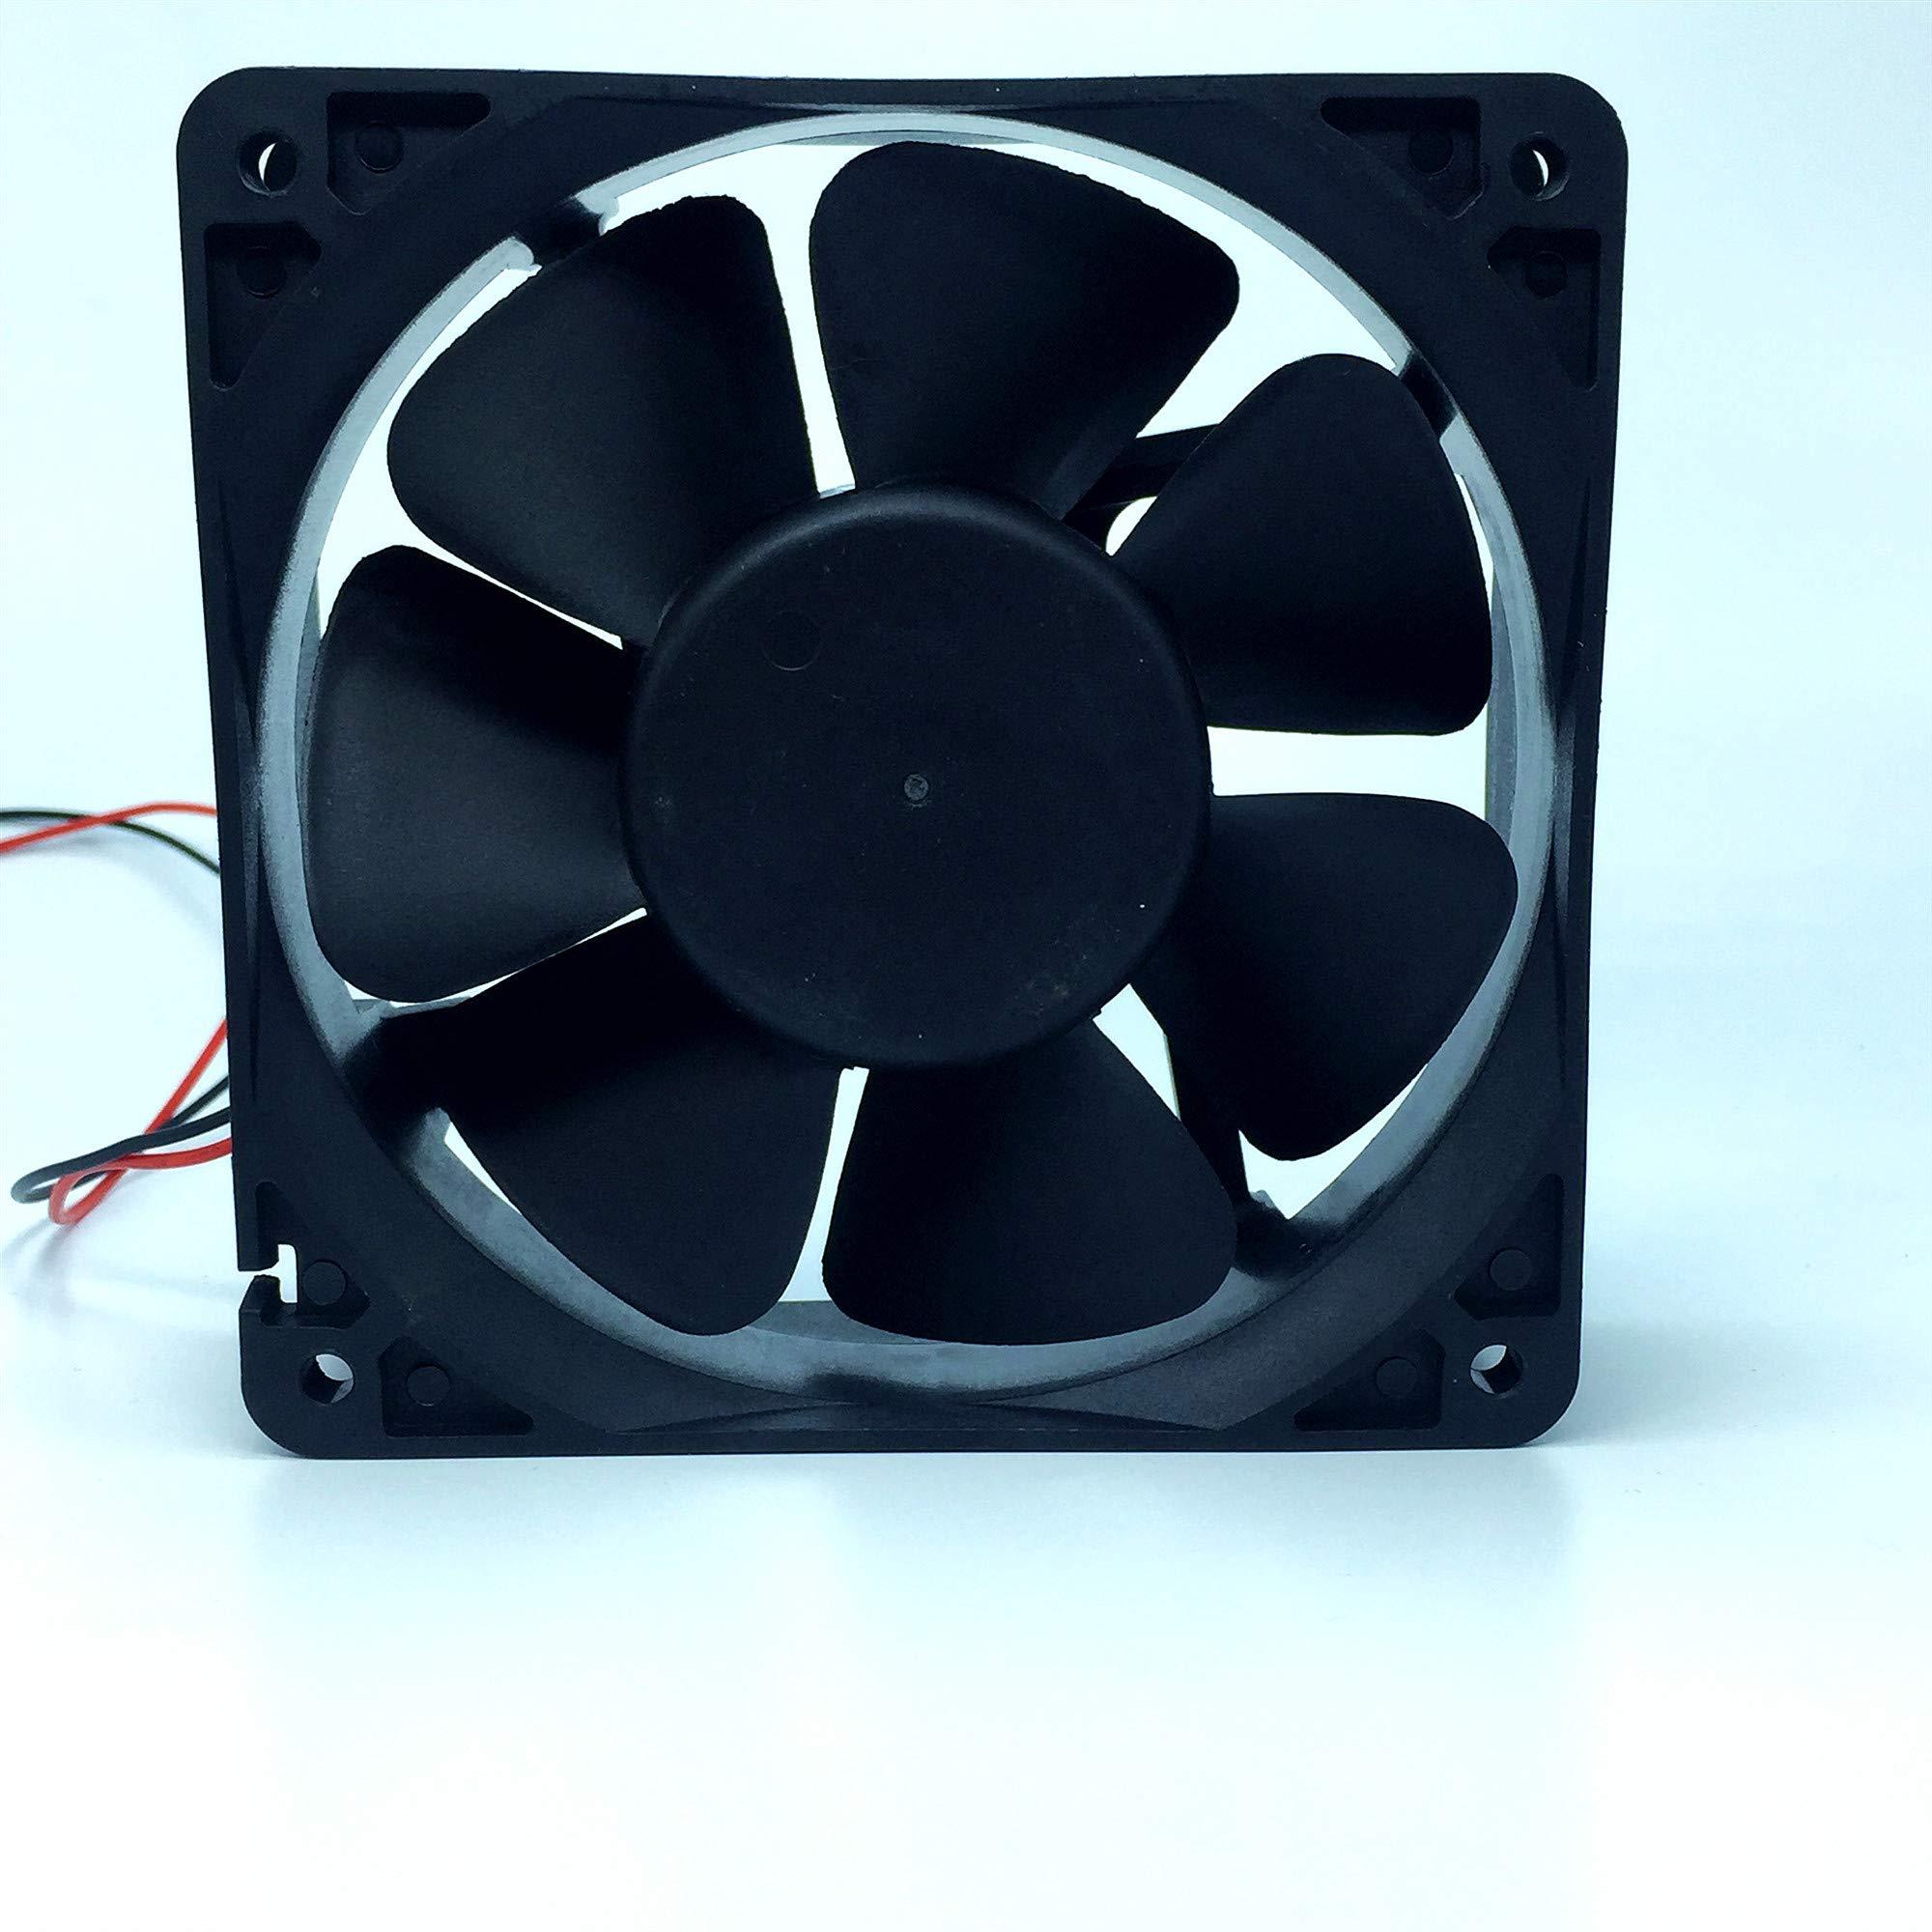 for RUNDA RD12038B24H 12038 24V 0.36A Welding Machine Cooling Fan by Huaxing